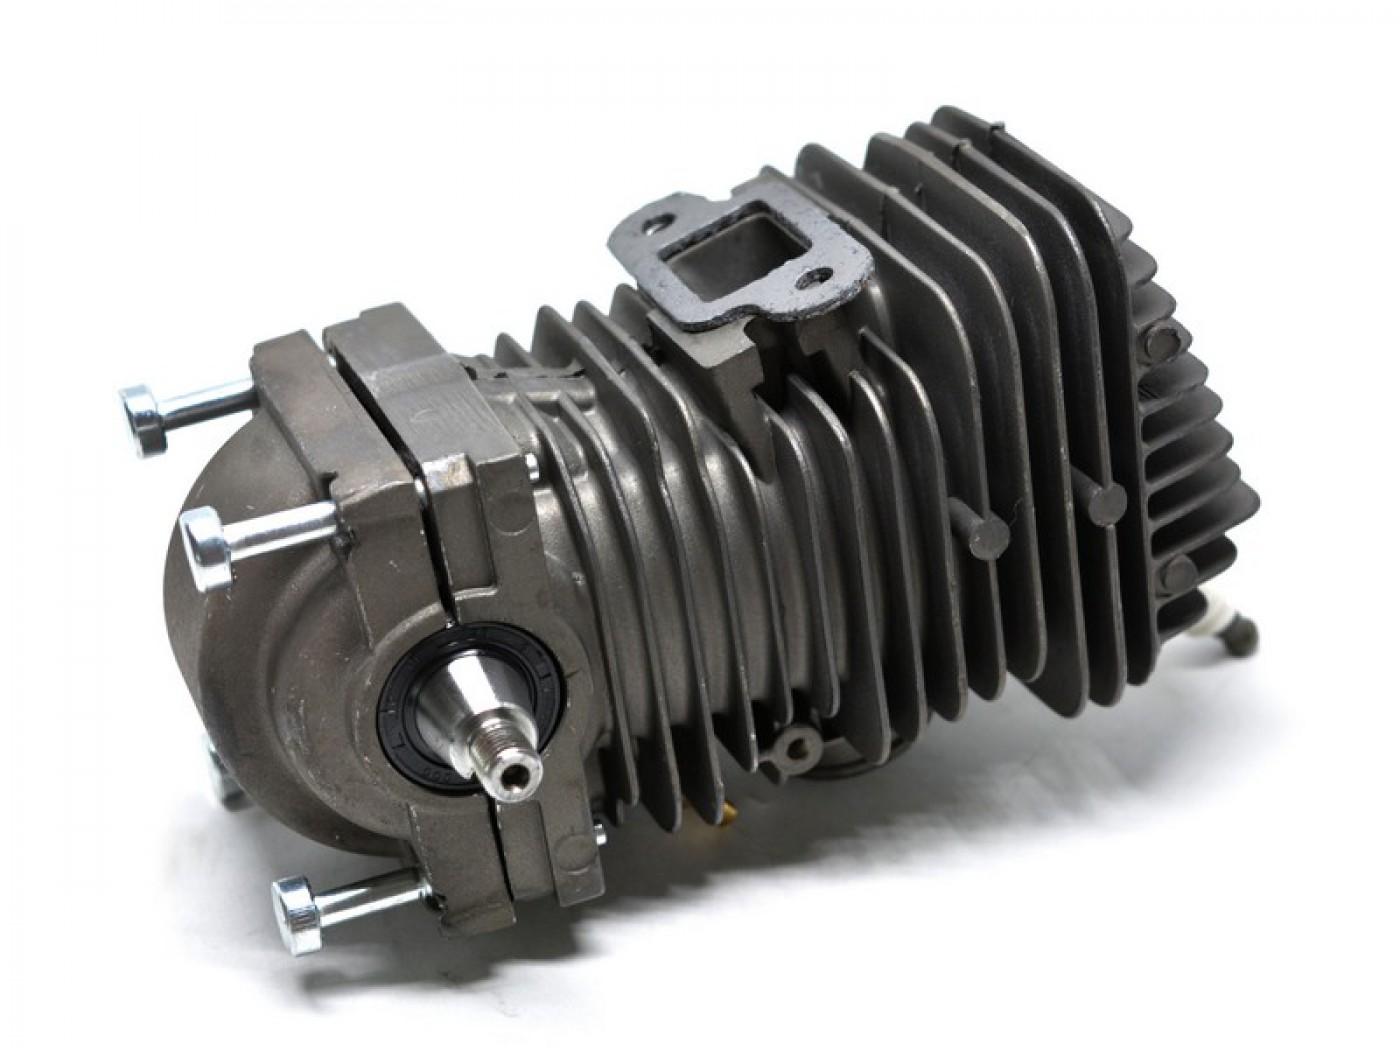 Motor Stihl MS230 023 MS 210 021 SUPER AKCE sleva 1300 Kč